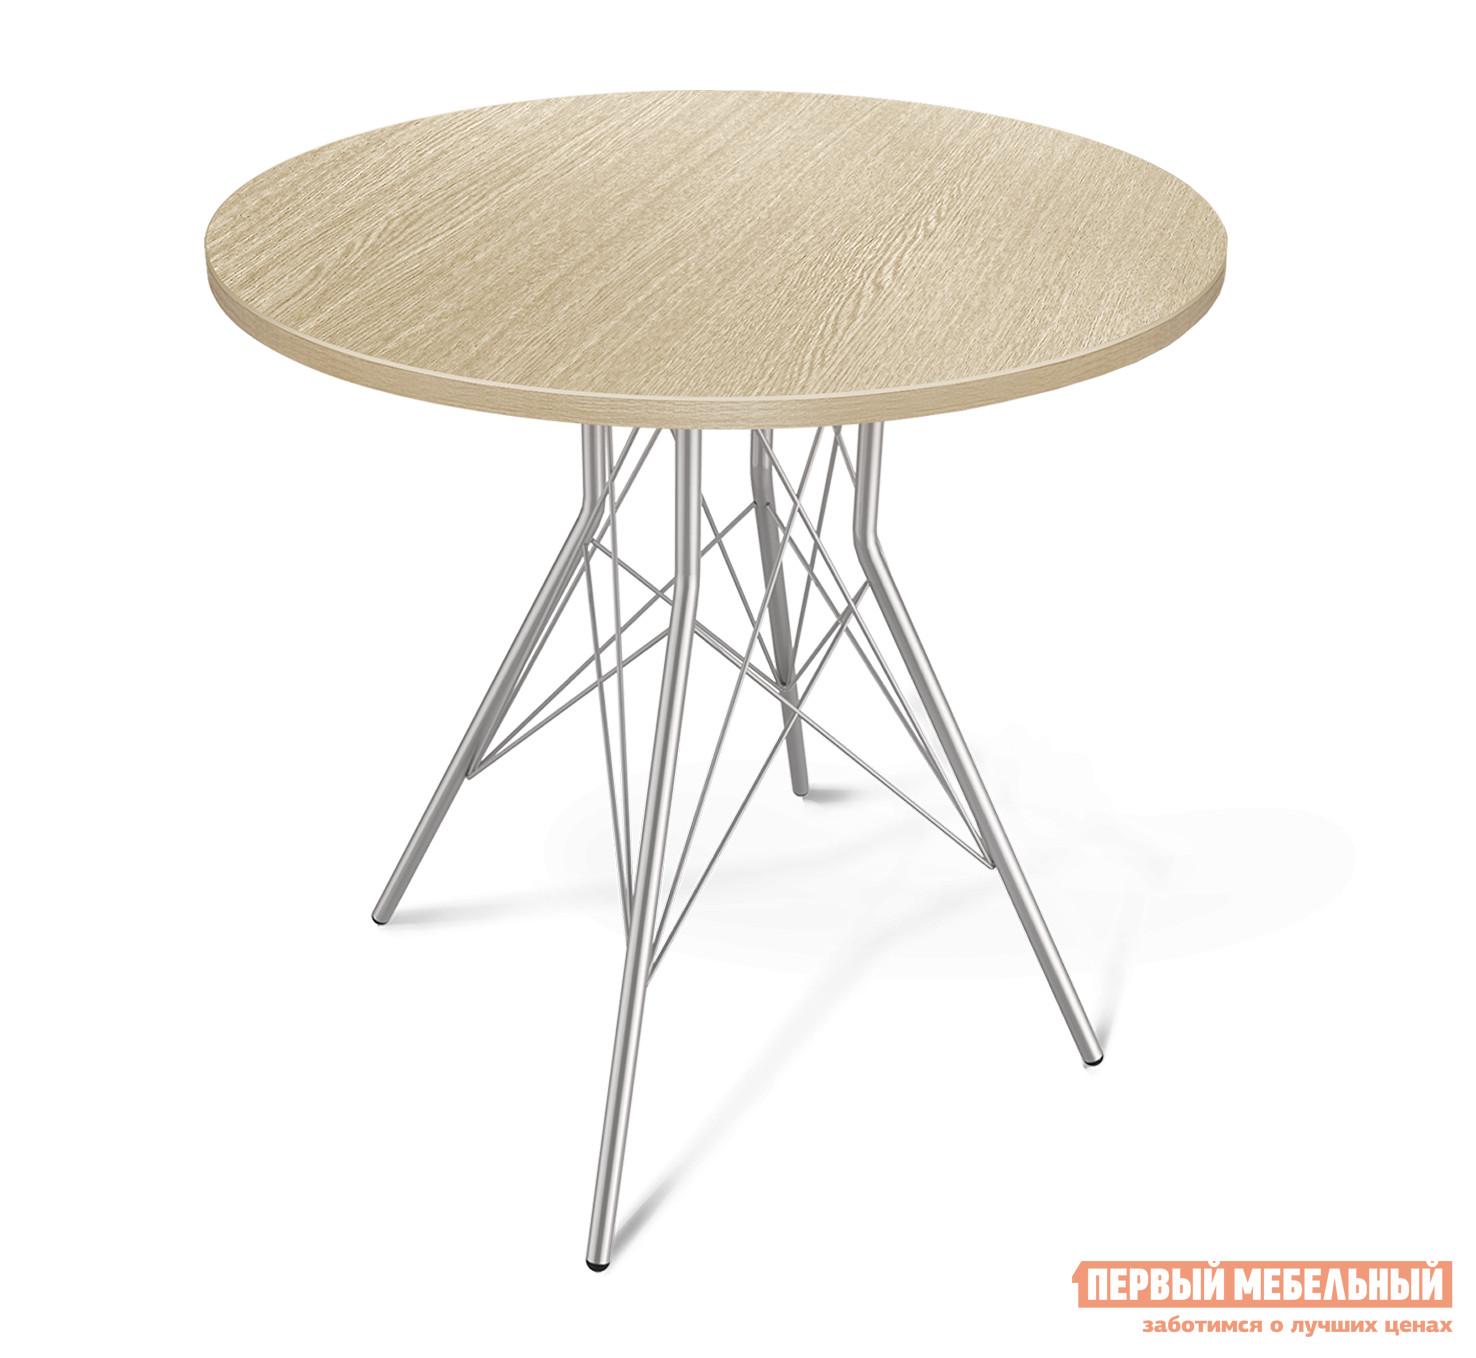 Кухонный стол  SHT-ТU2 + SHT-TT 80 ЛДСП Дуб беленый  / Хром лак